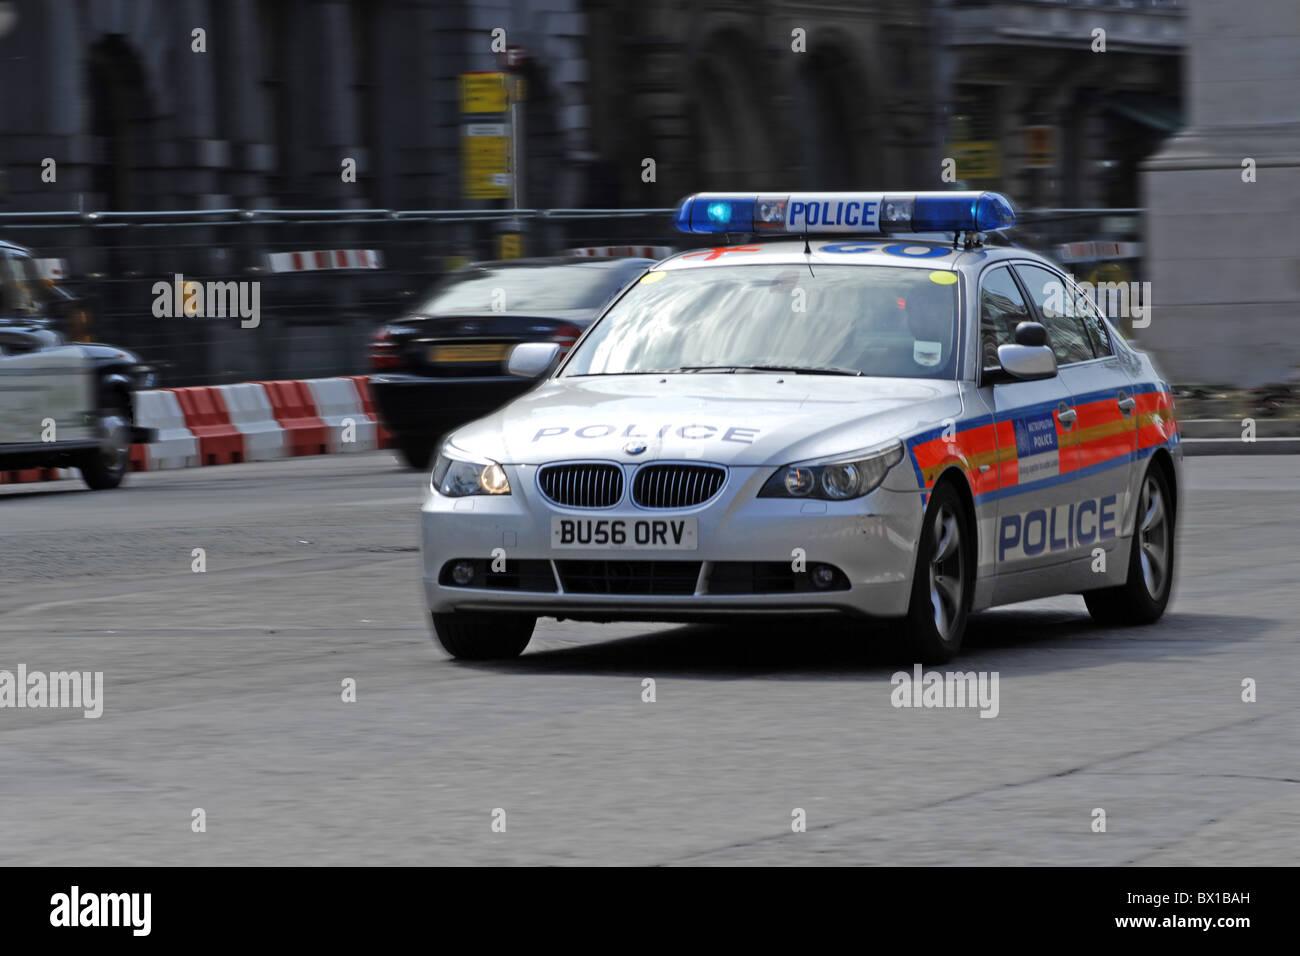 Police vehicle speeding through the streets of London Stock Photo